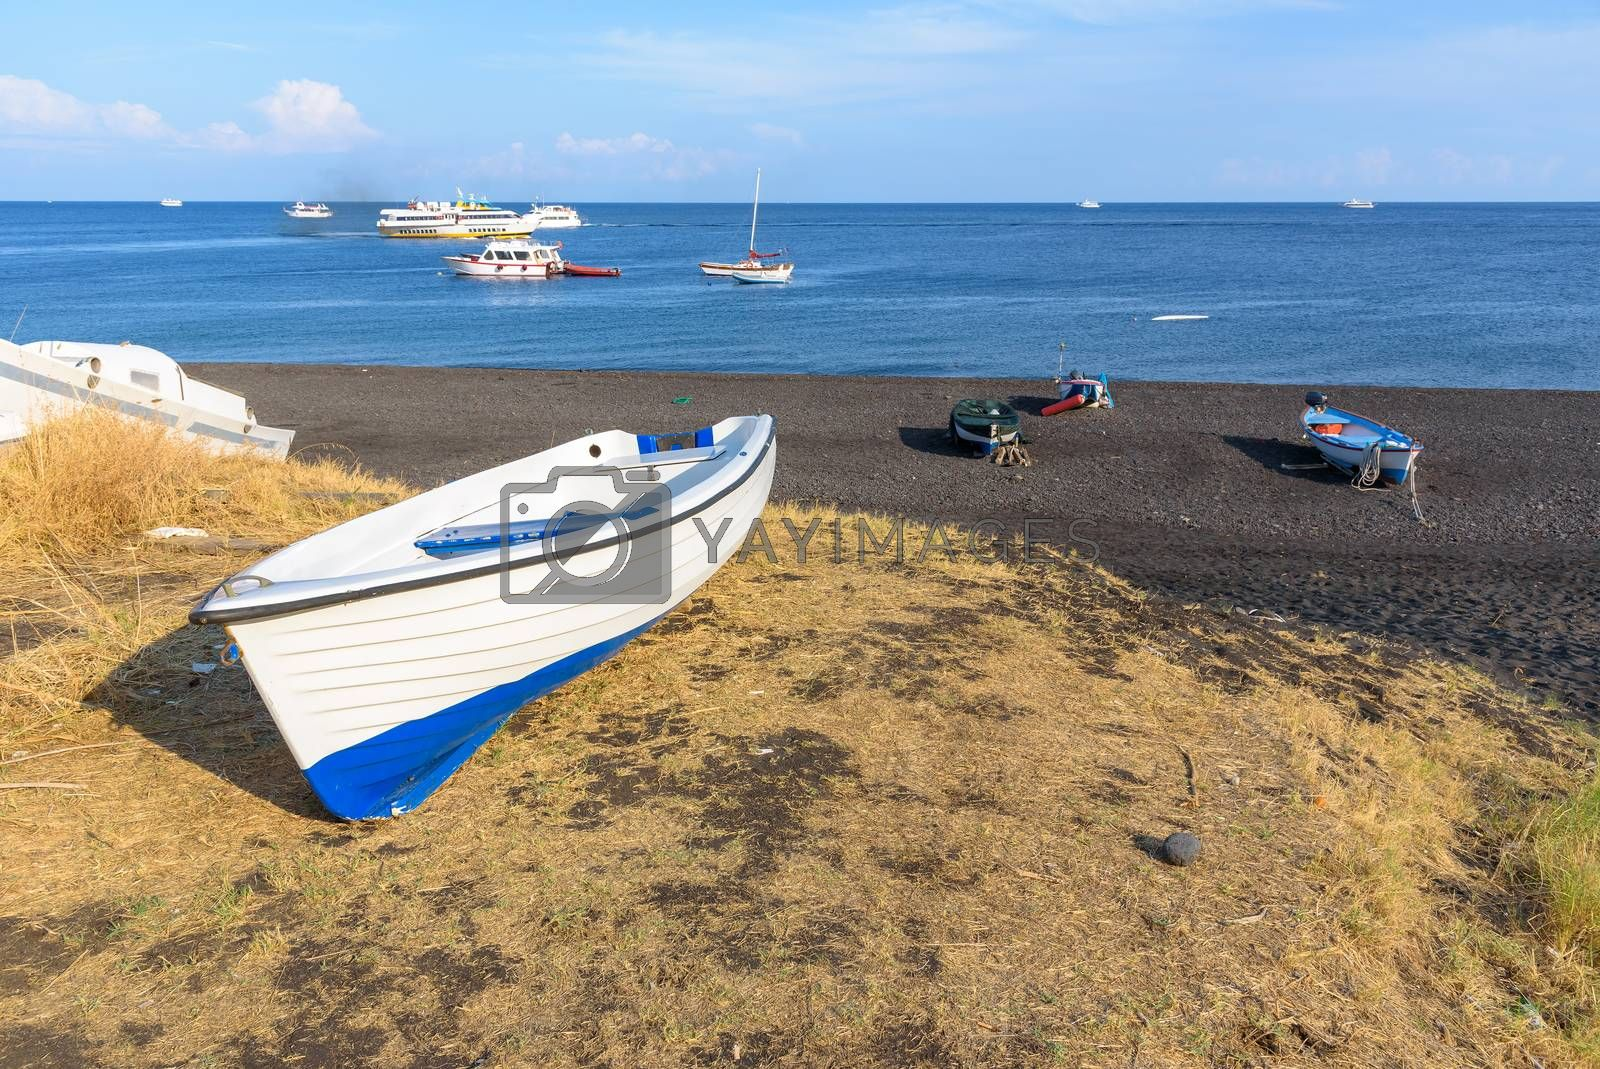 Boat on the black volcanic beach on Stromboli Island, Aeolian Islands, Italy